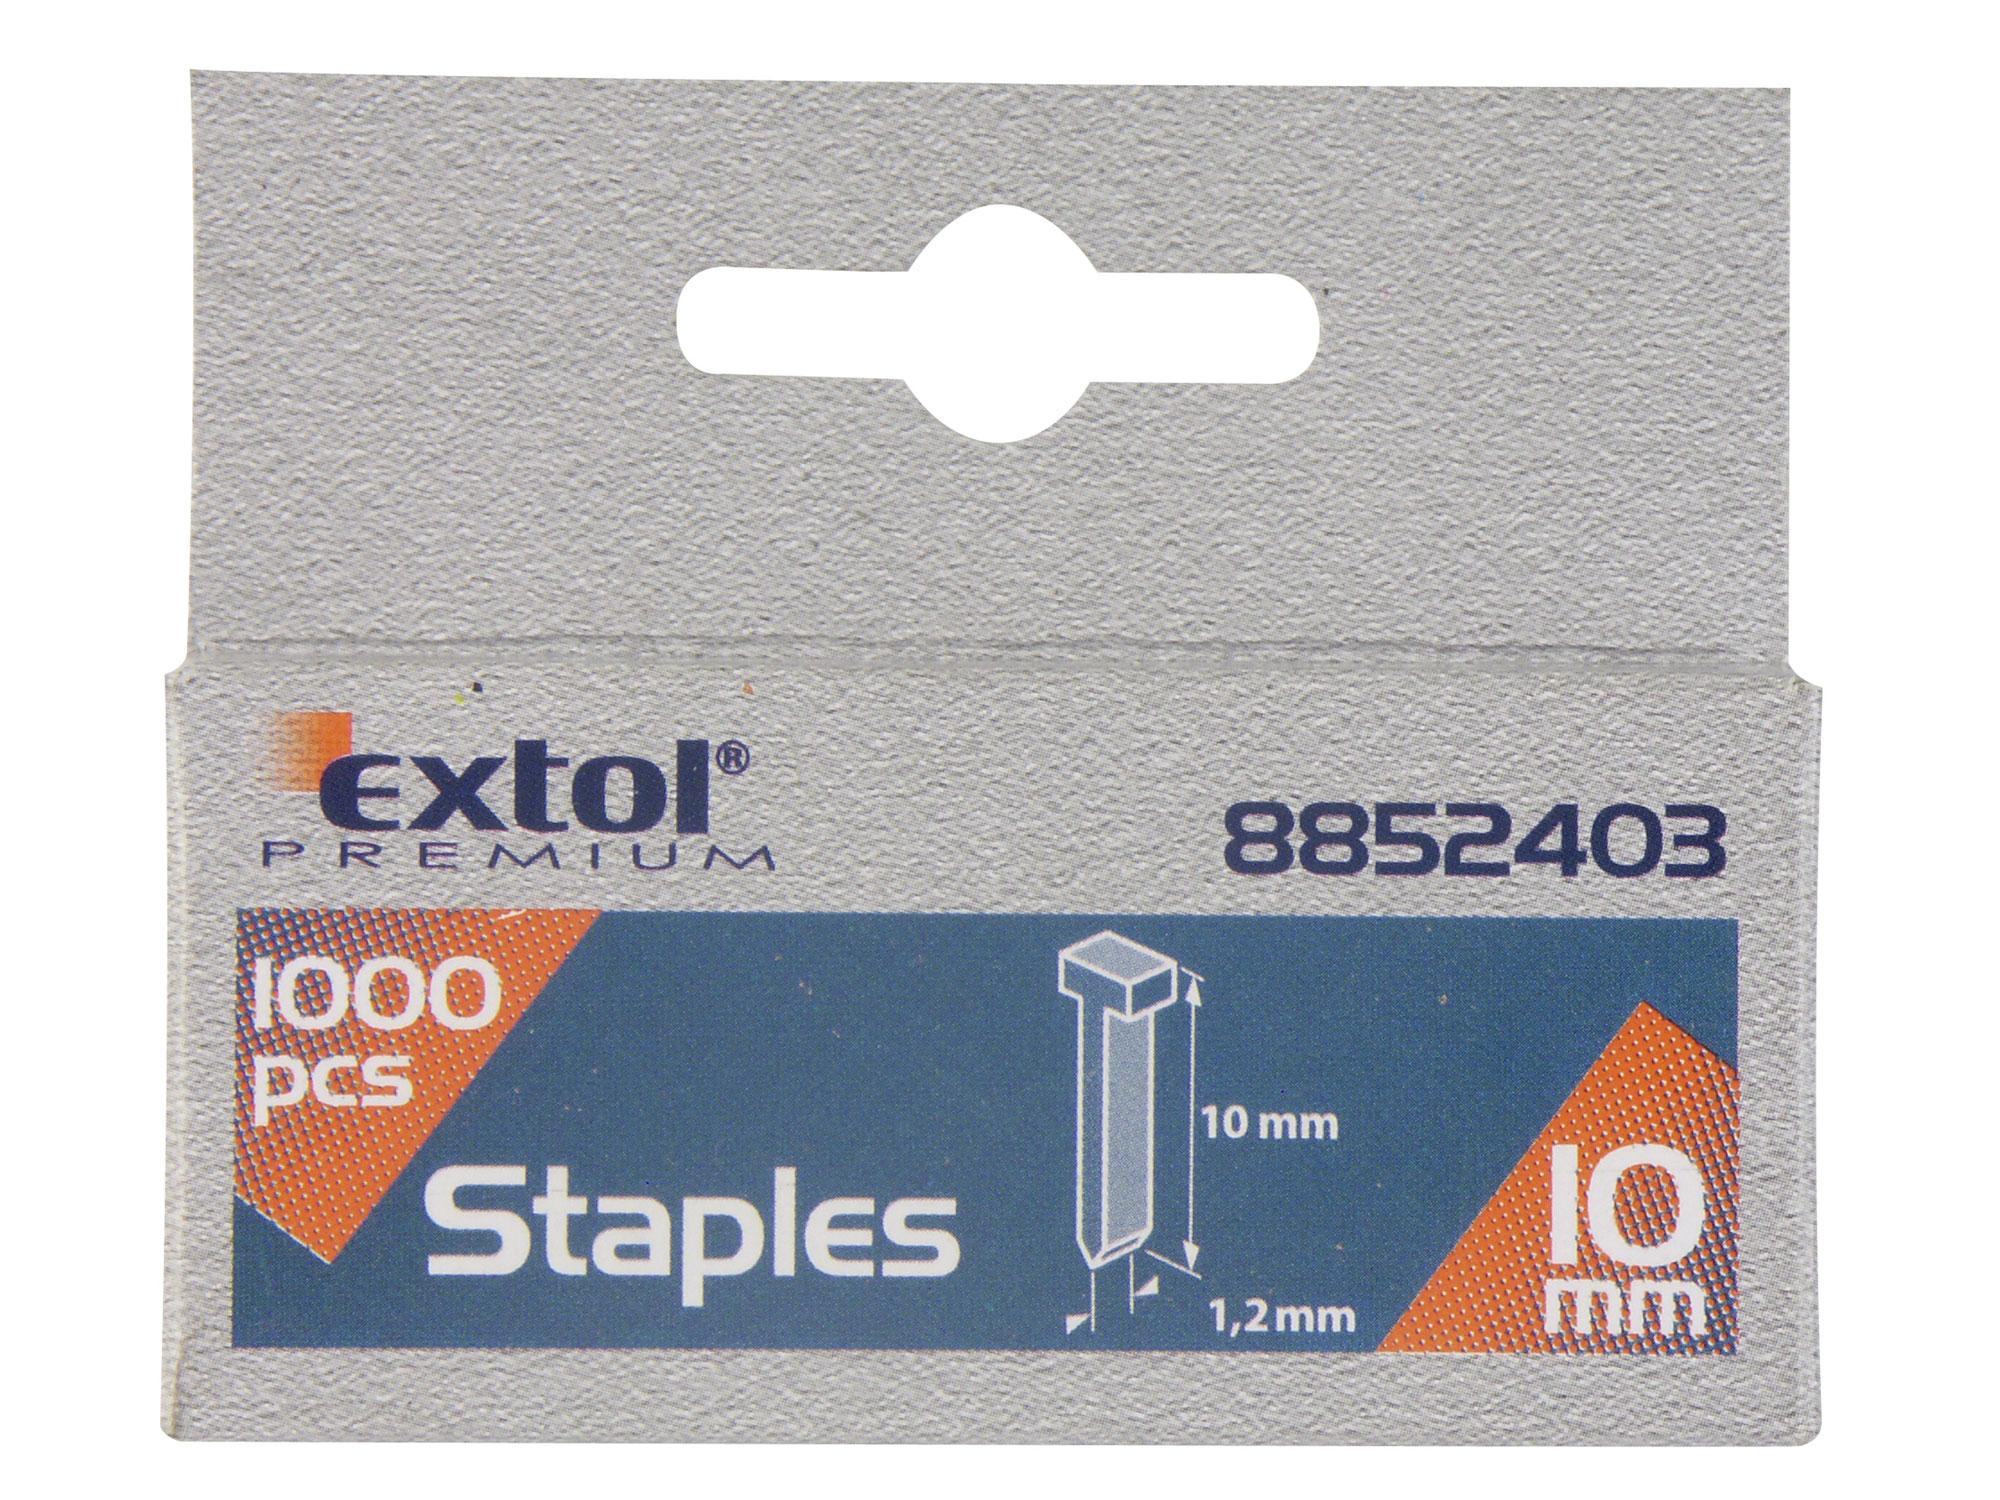 Hřebíky, balení 1000ks, 10mm, 2,0x0,52x1,2mm EXTOL PREMIUM 8852403